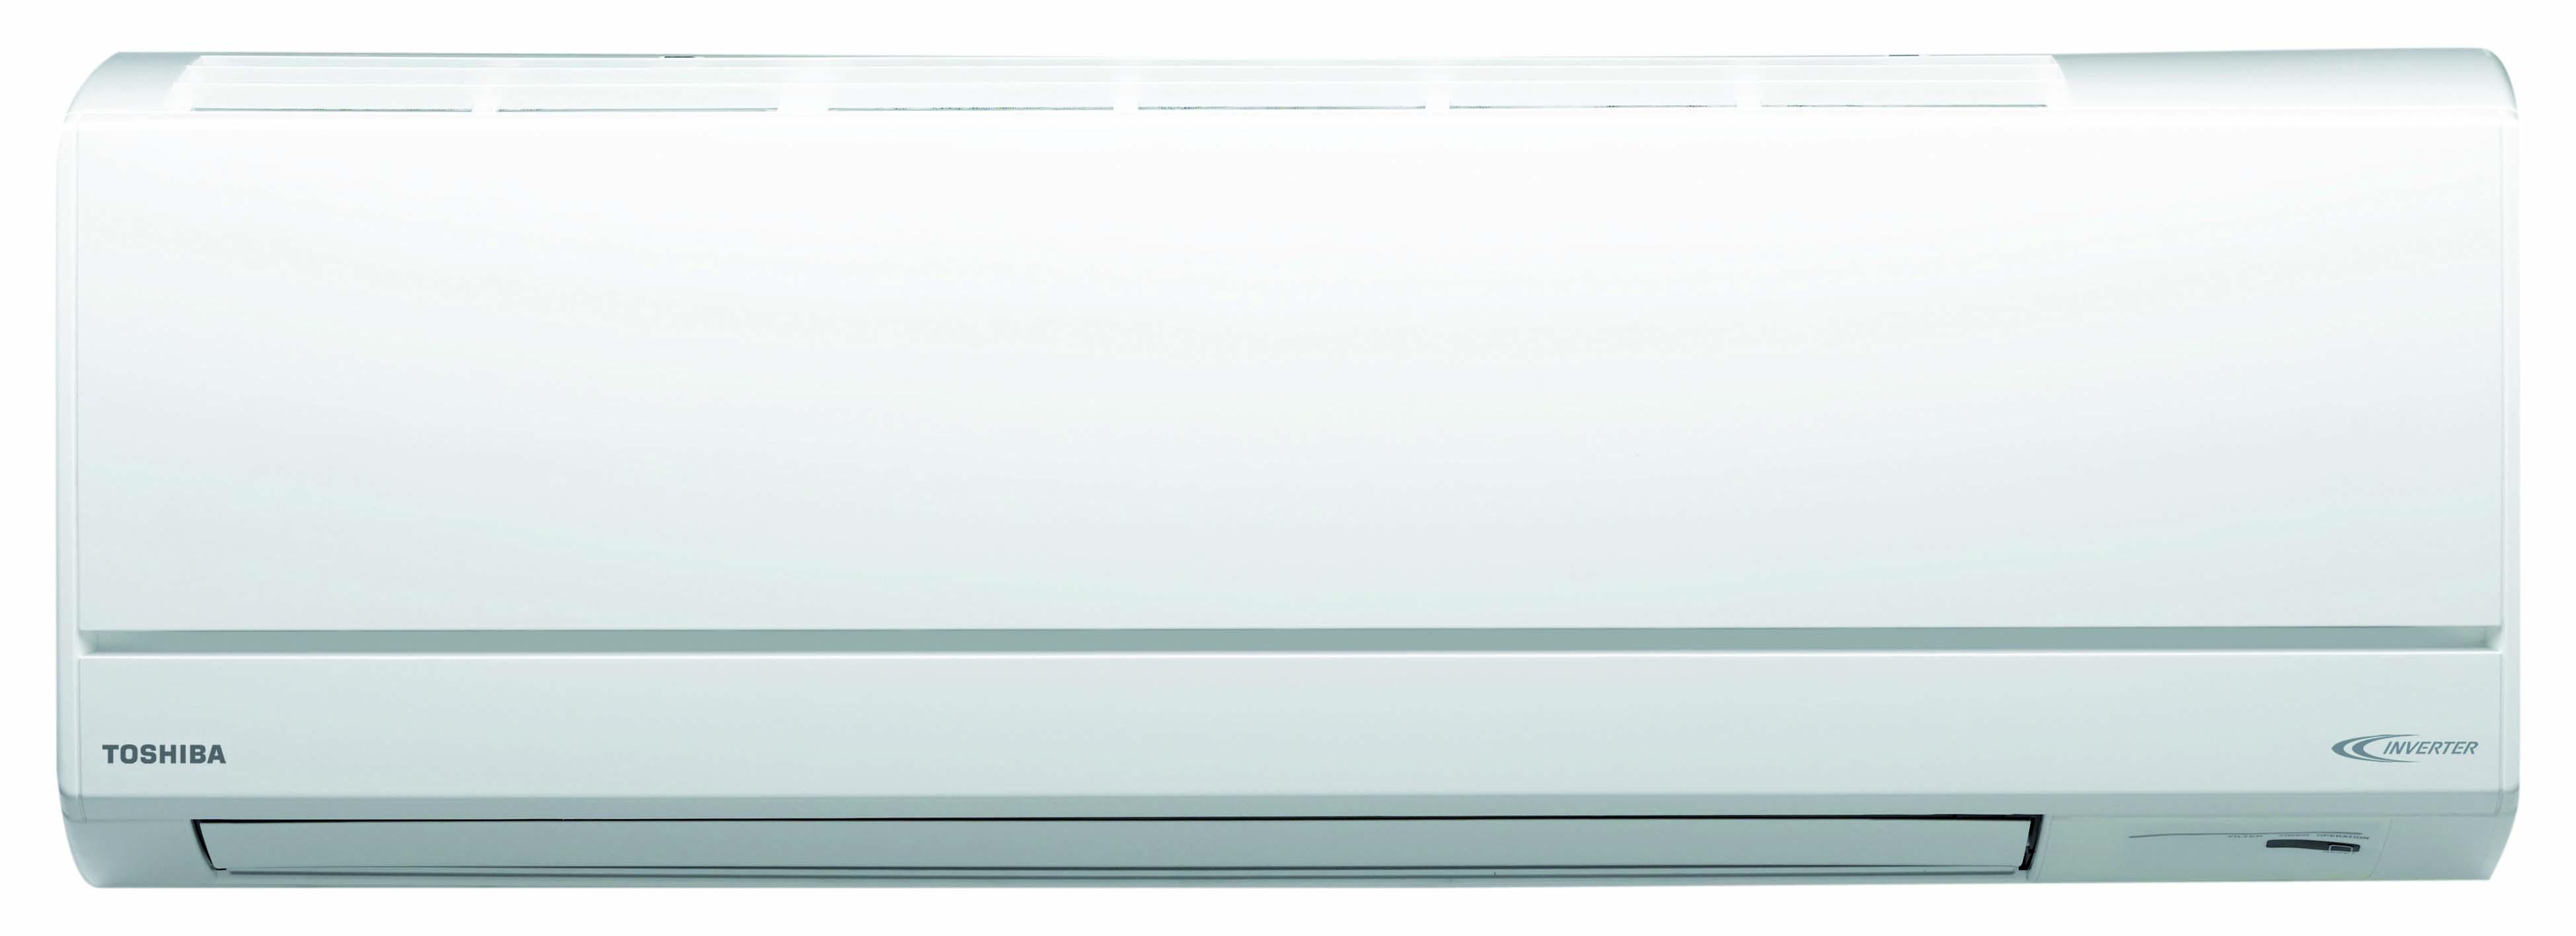 AvAnt inwerter ścienny - model 2014